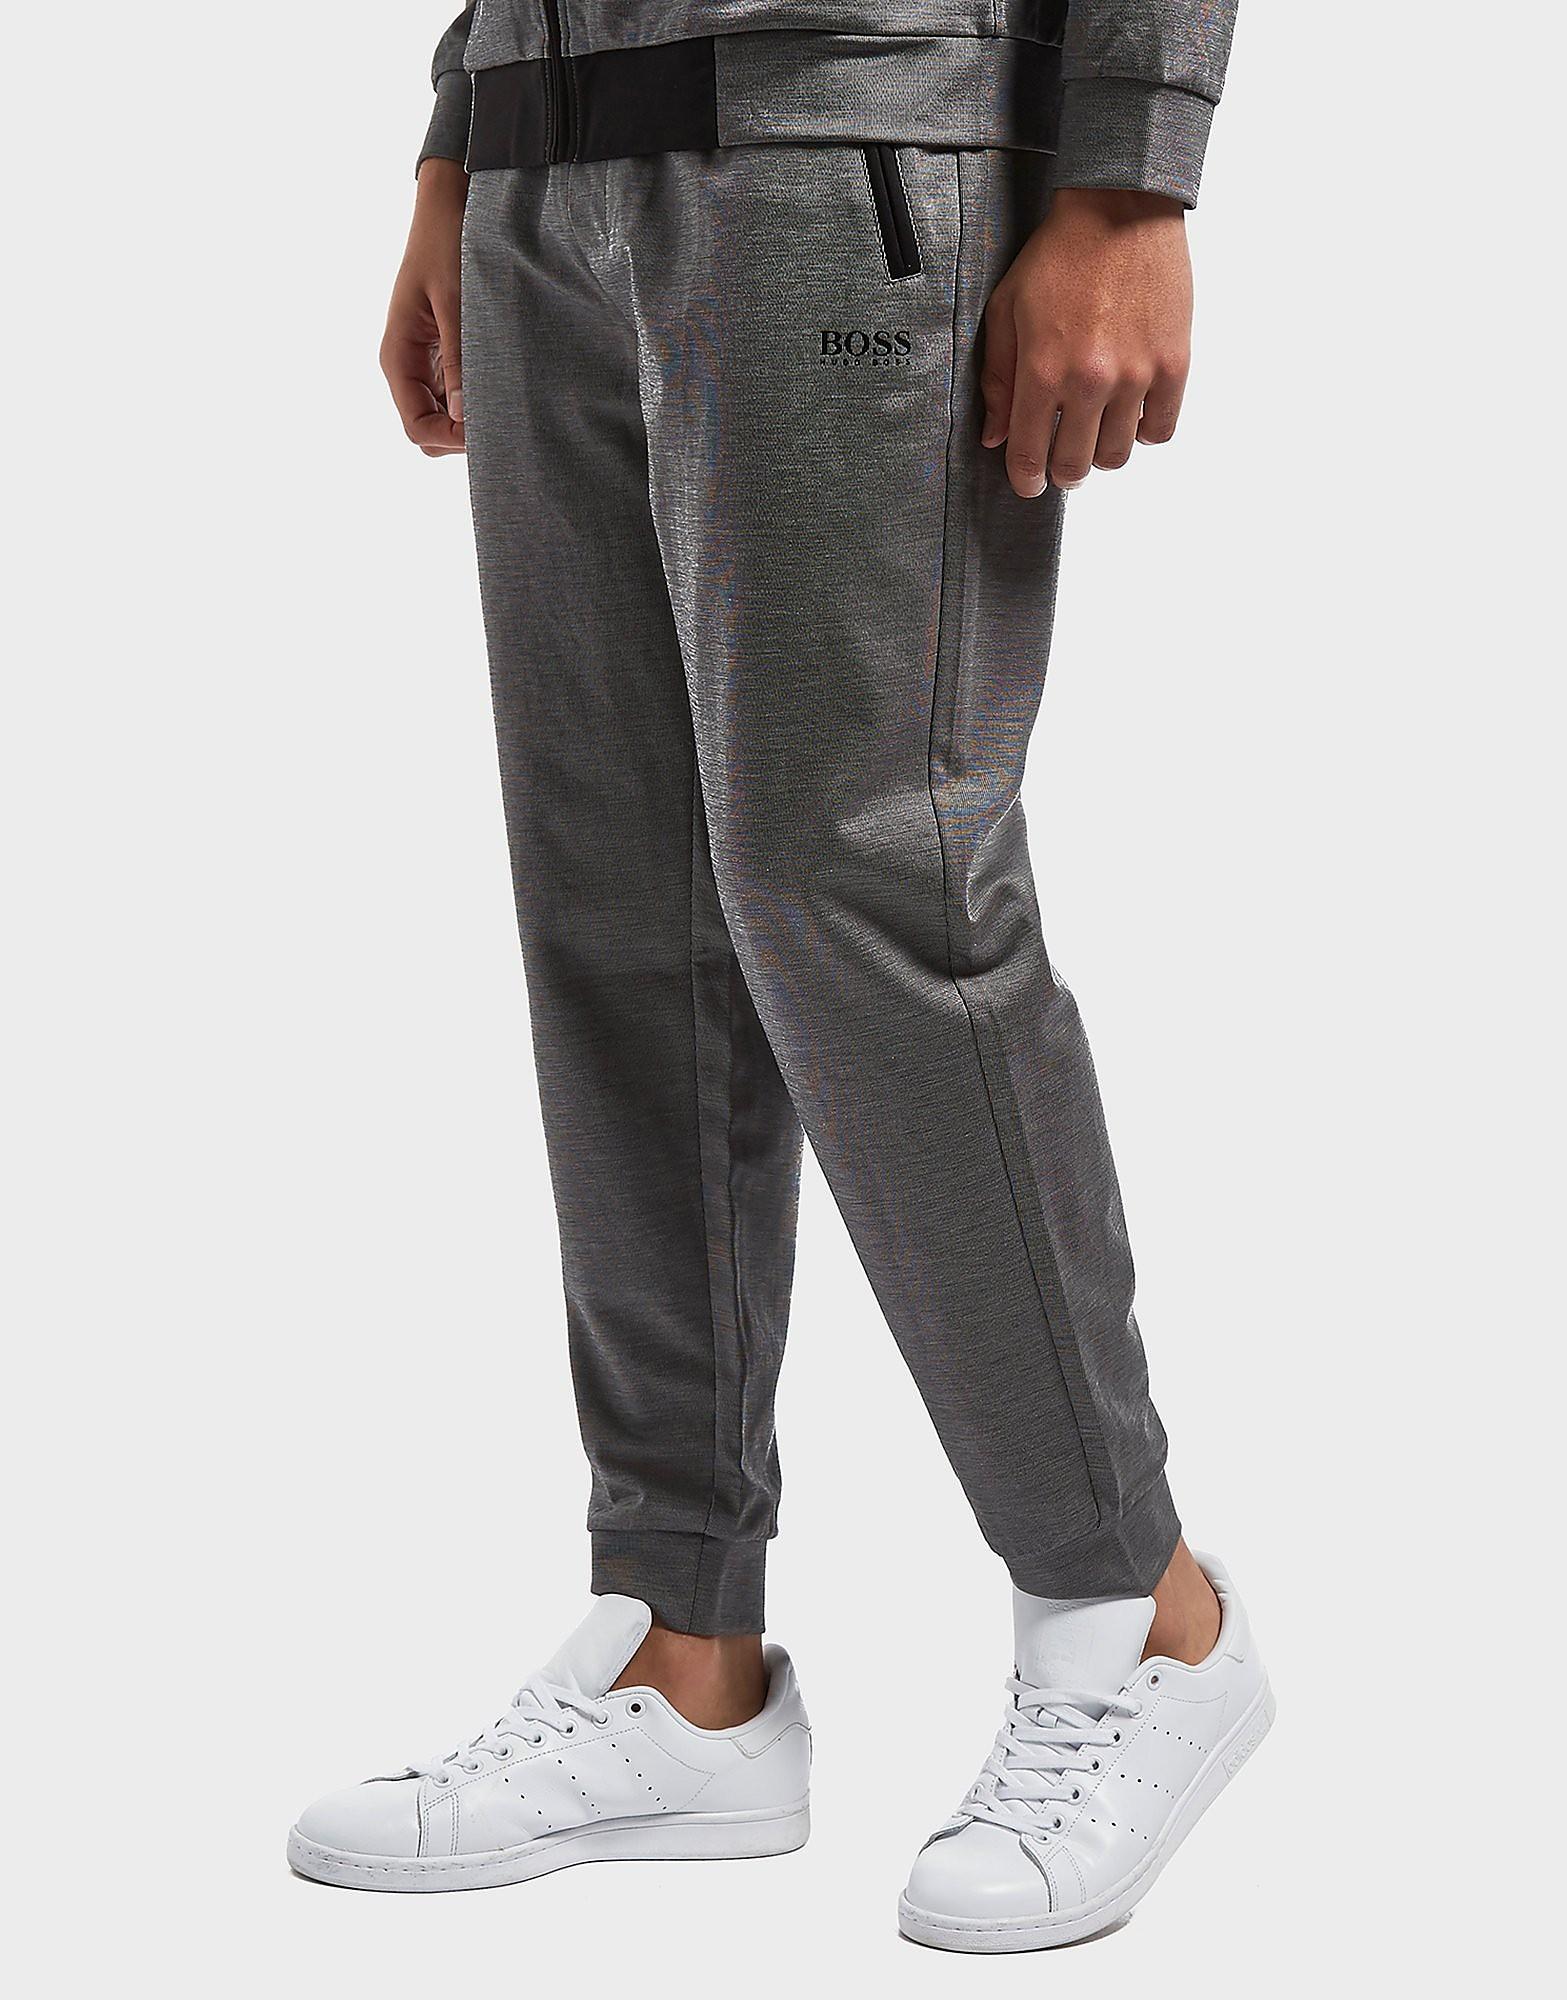 BOSS Interlock Cuffed Track Pants